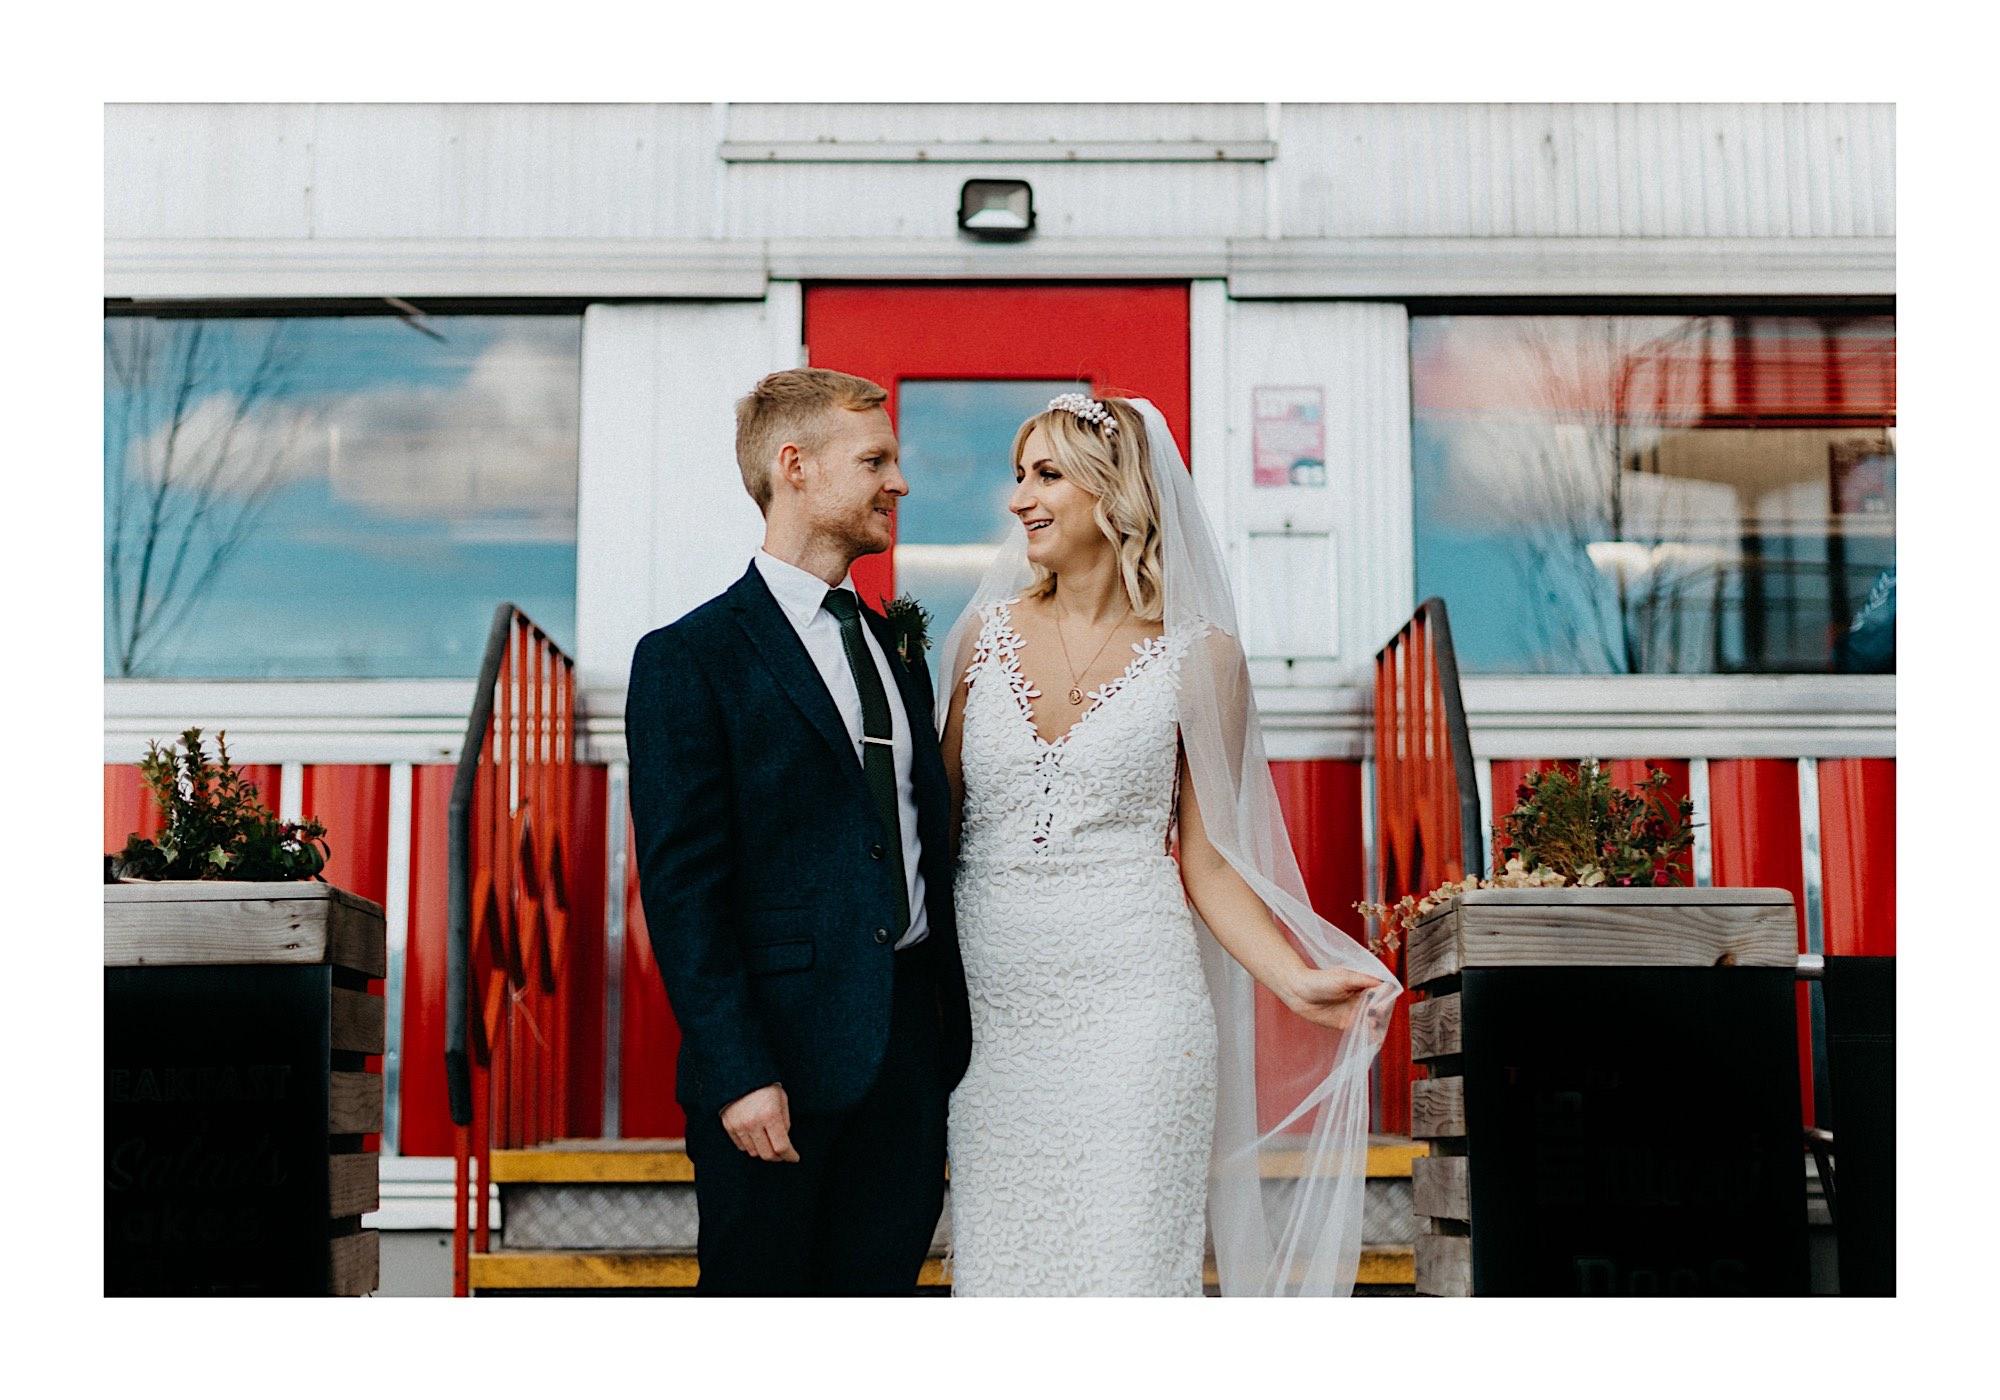 wedding photography at trinity buoy wharf diner